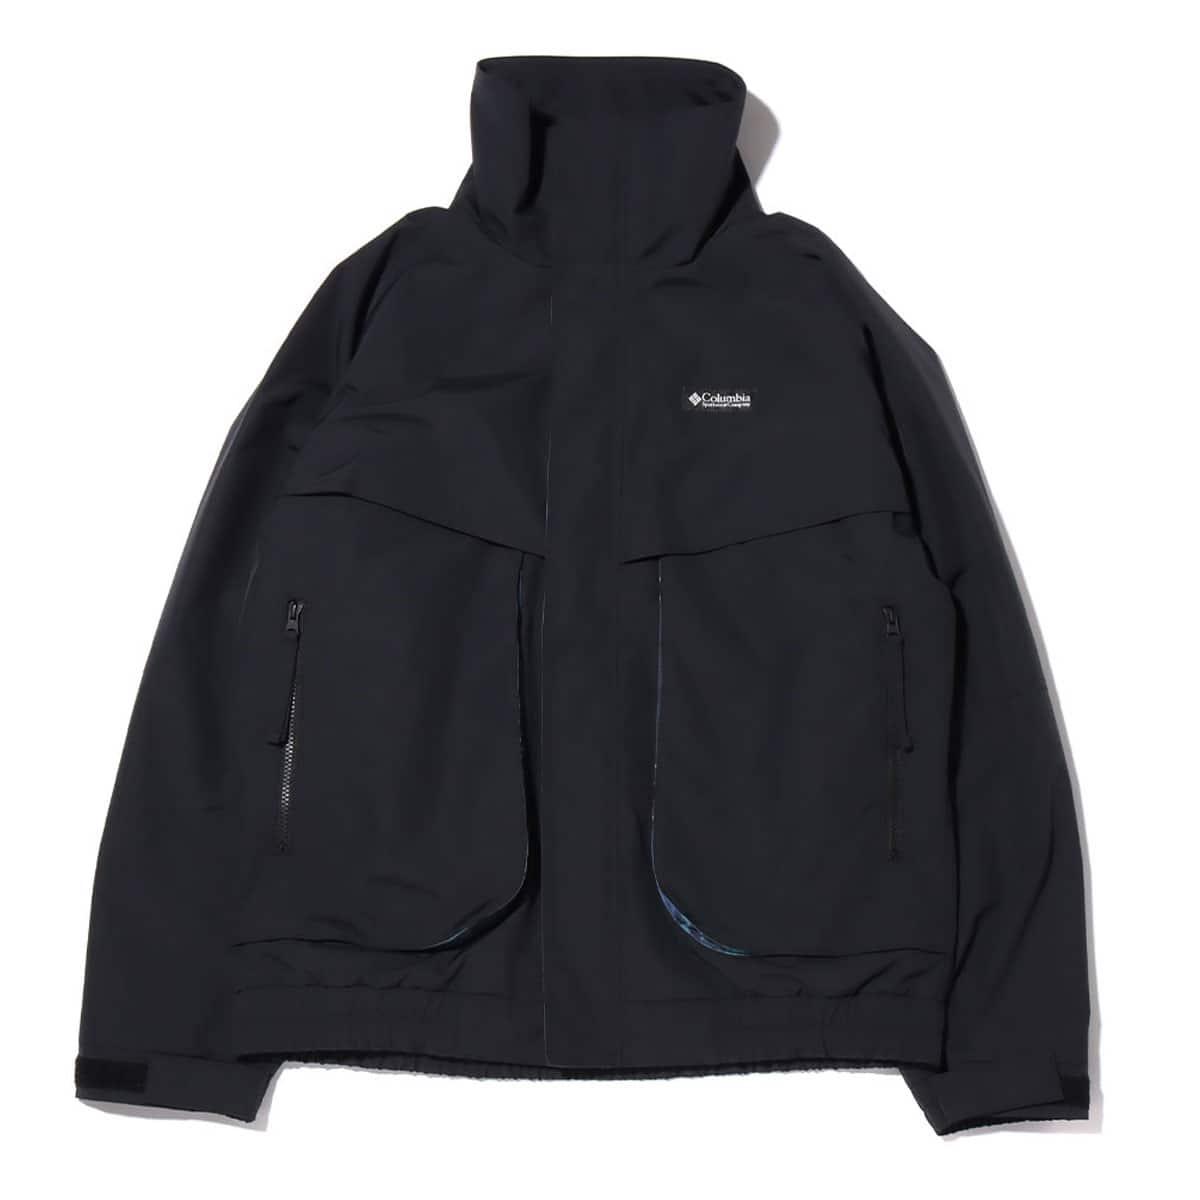 Columbia x ATMOS LAB Powder Keg™ Jacket BLACK 20FA-S_photo_large